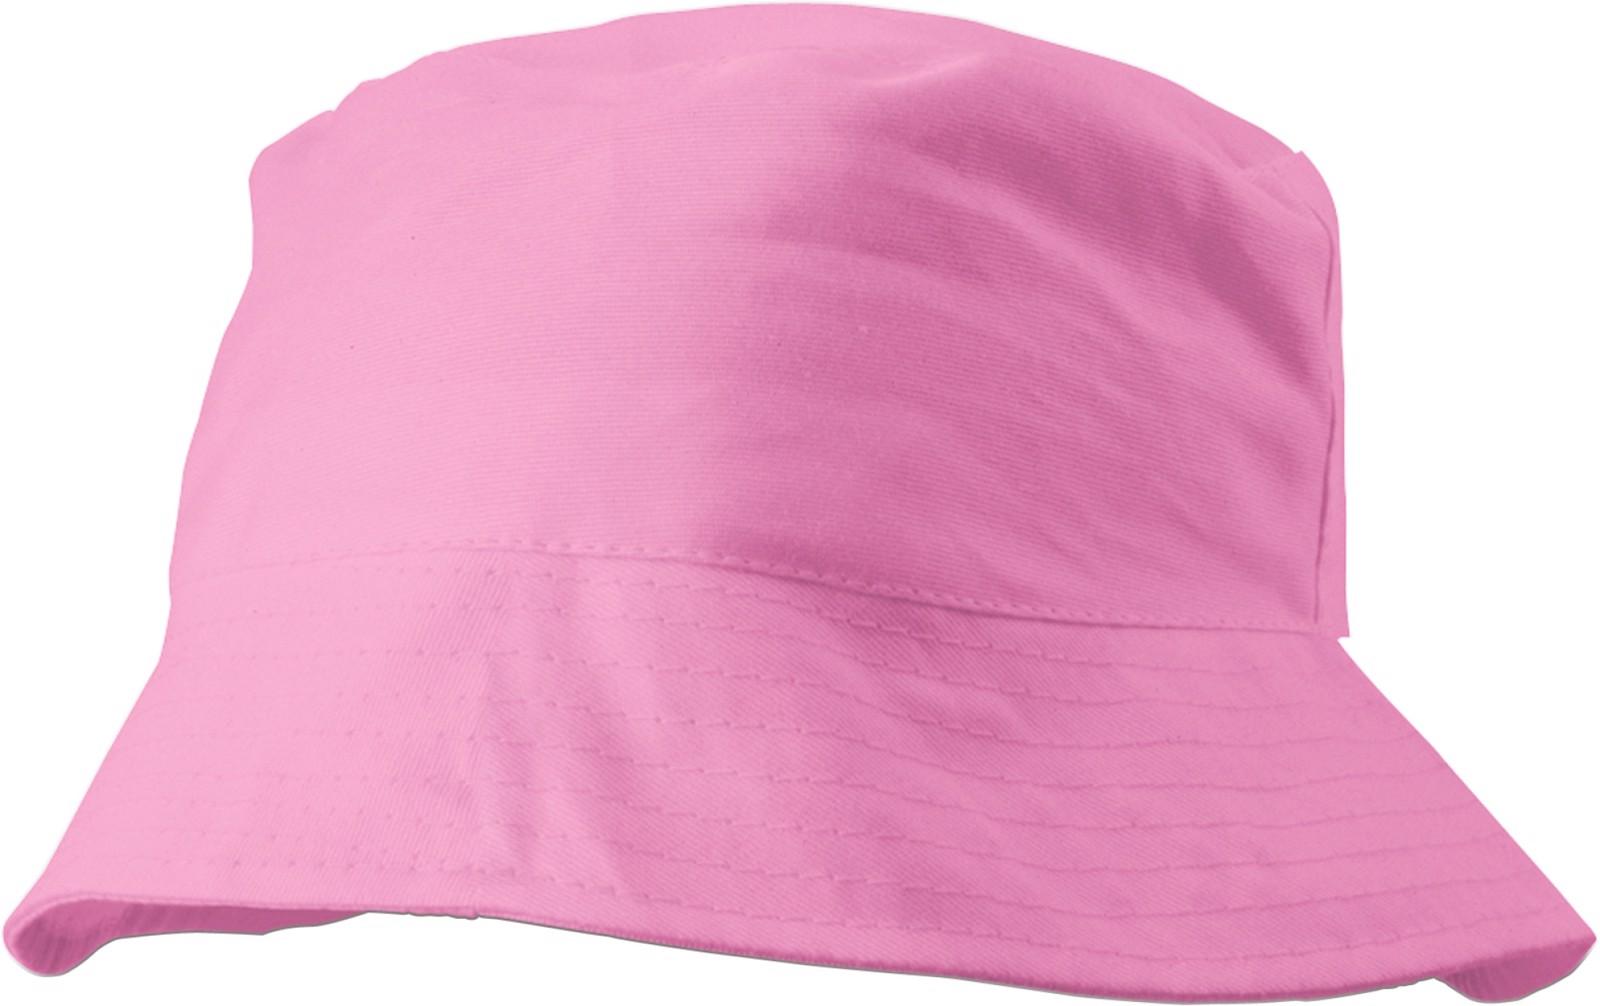 Cotton sun hat - Pink